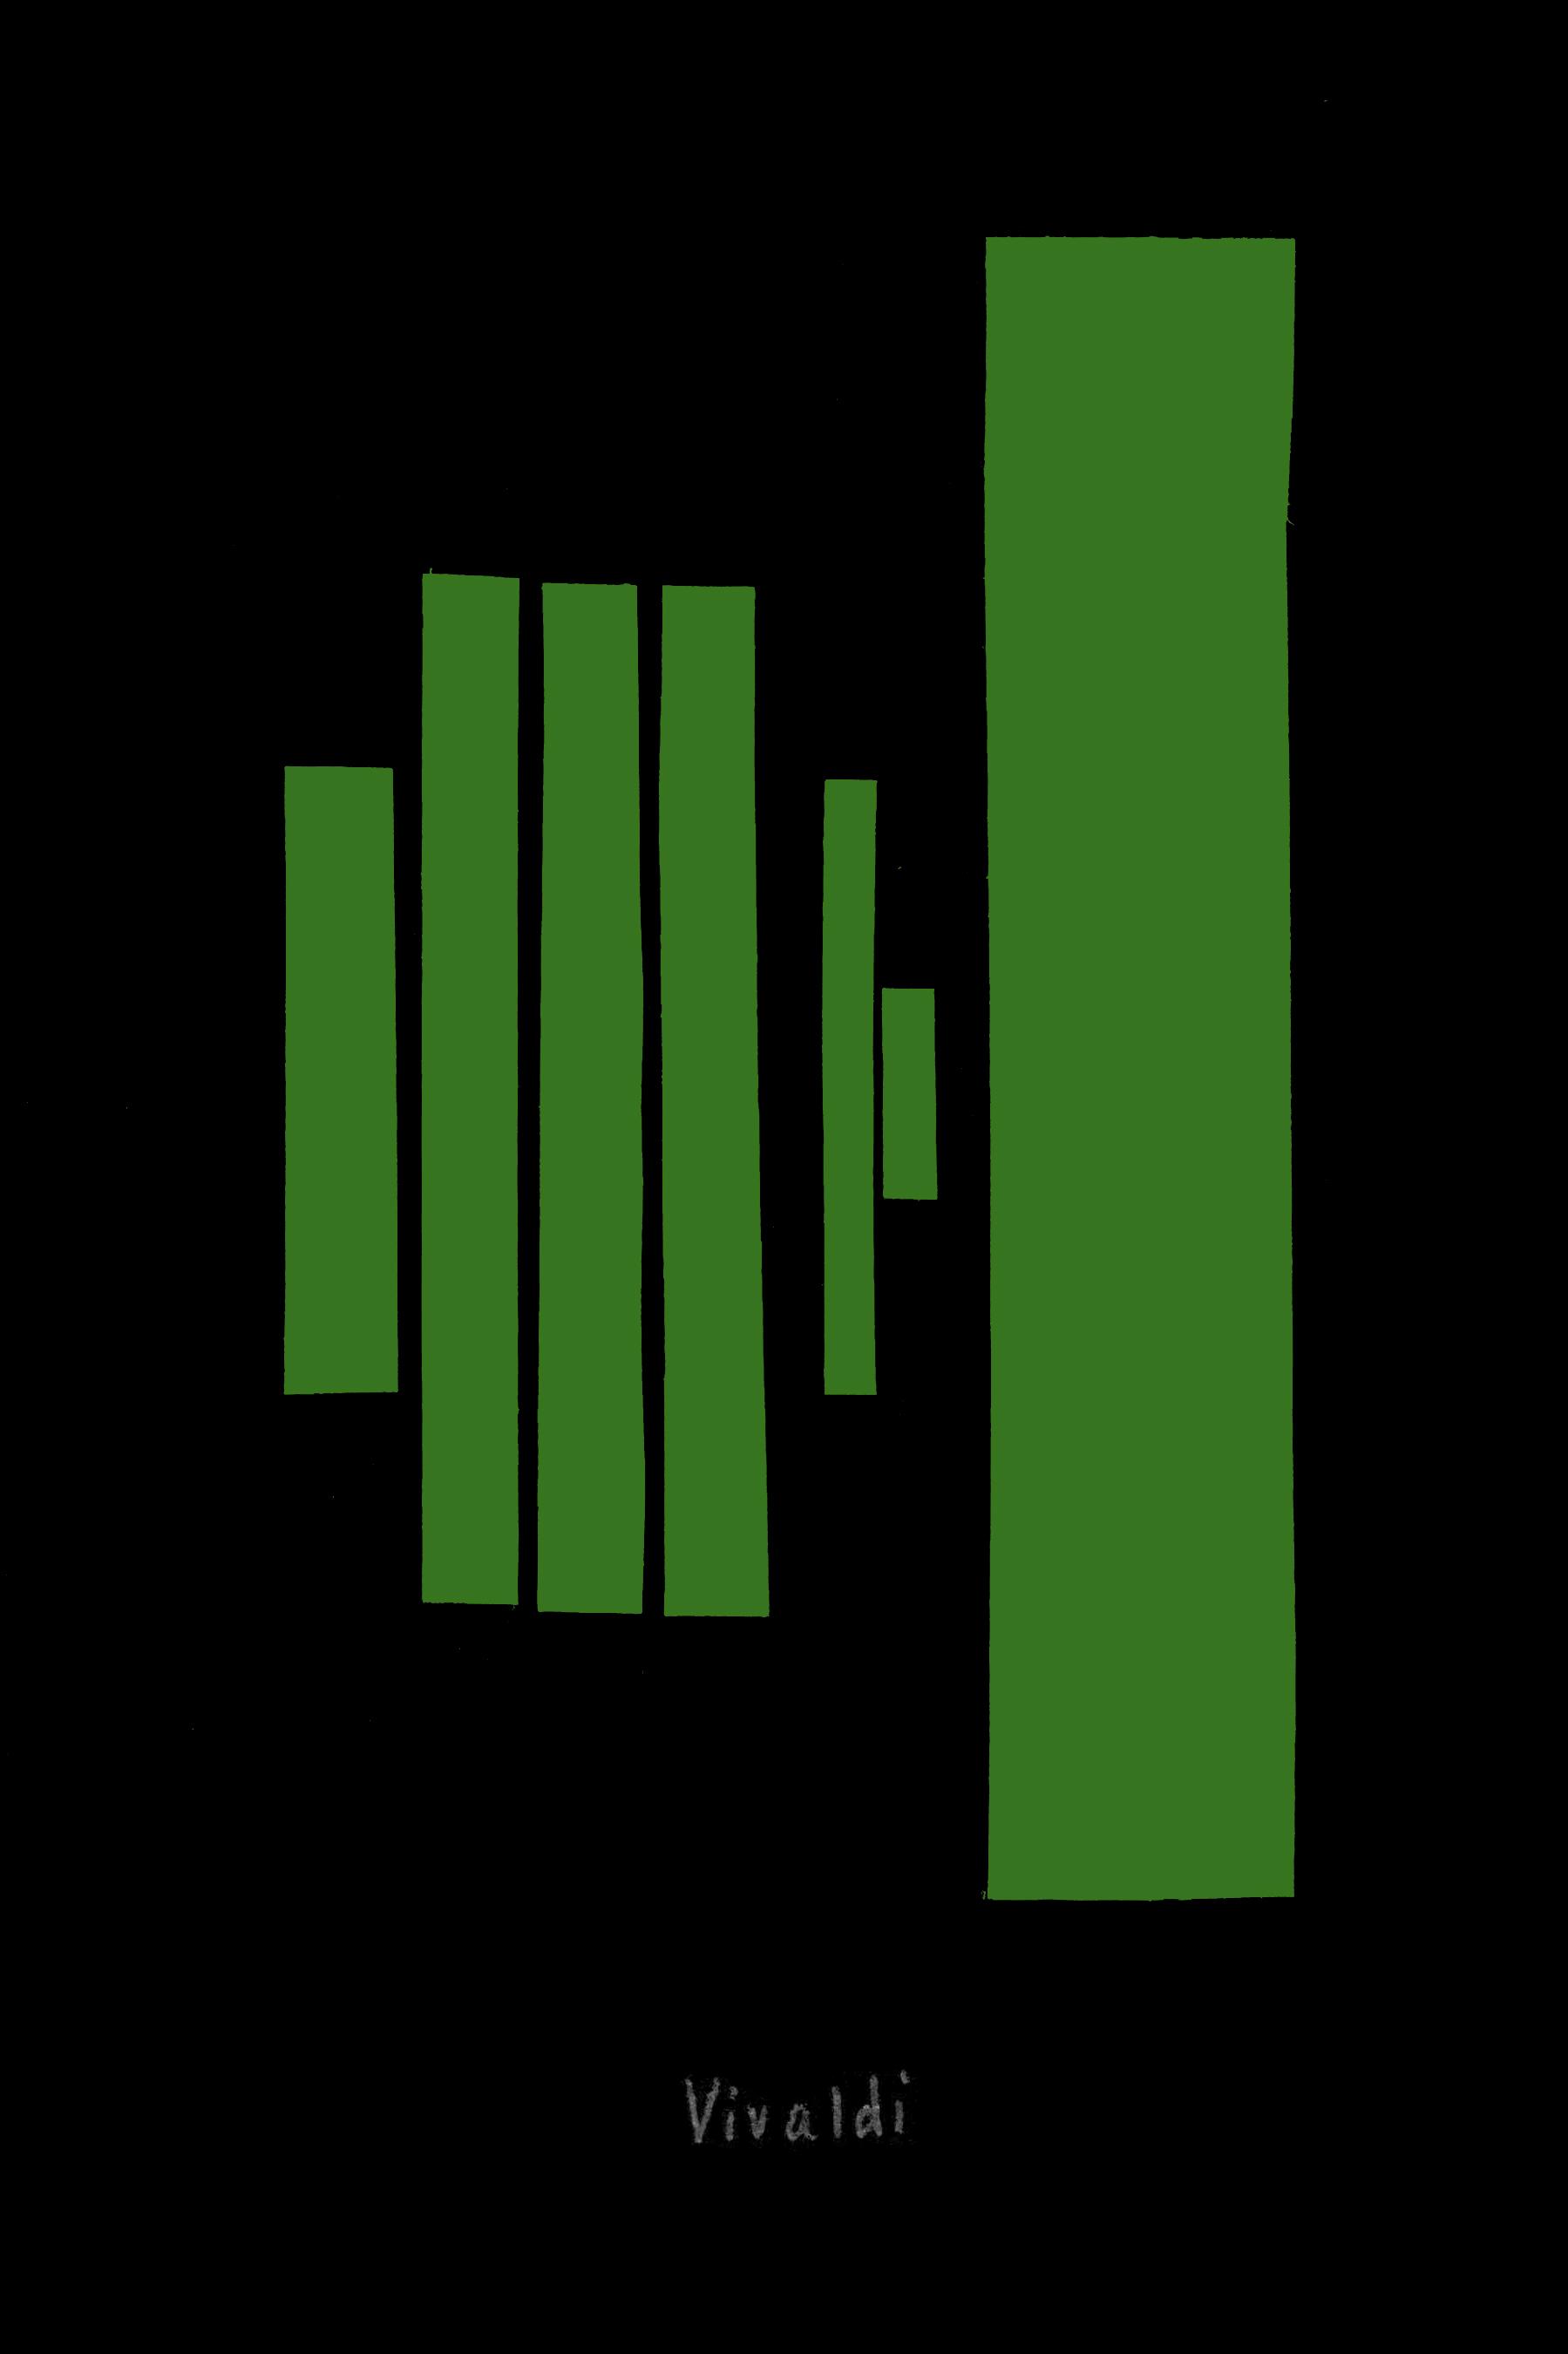 classical composer series, collage no. 2 Vivaldi